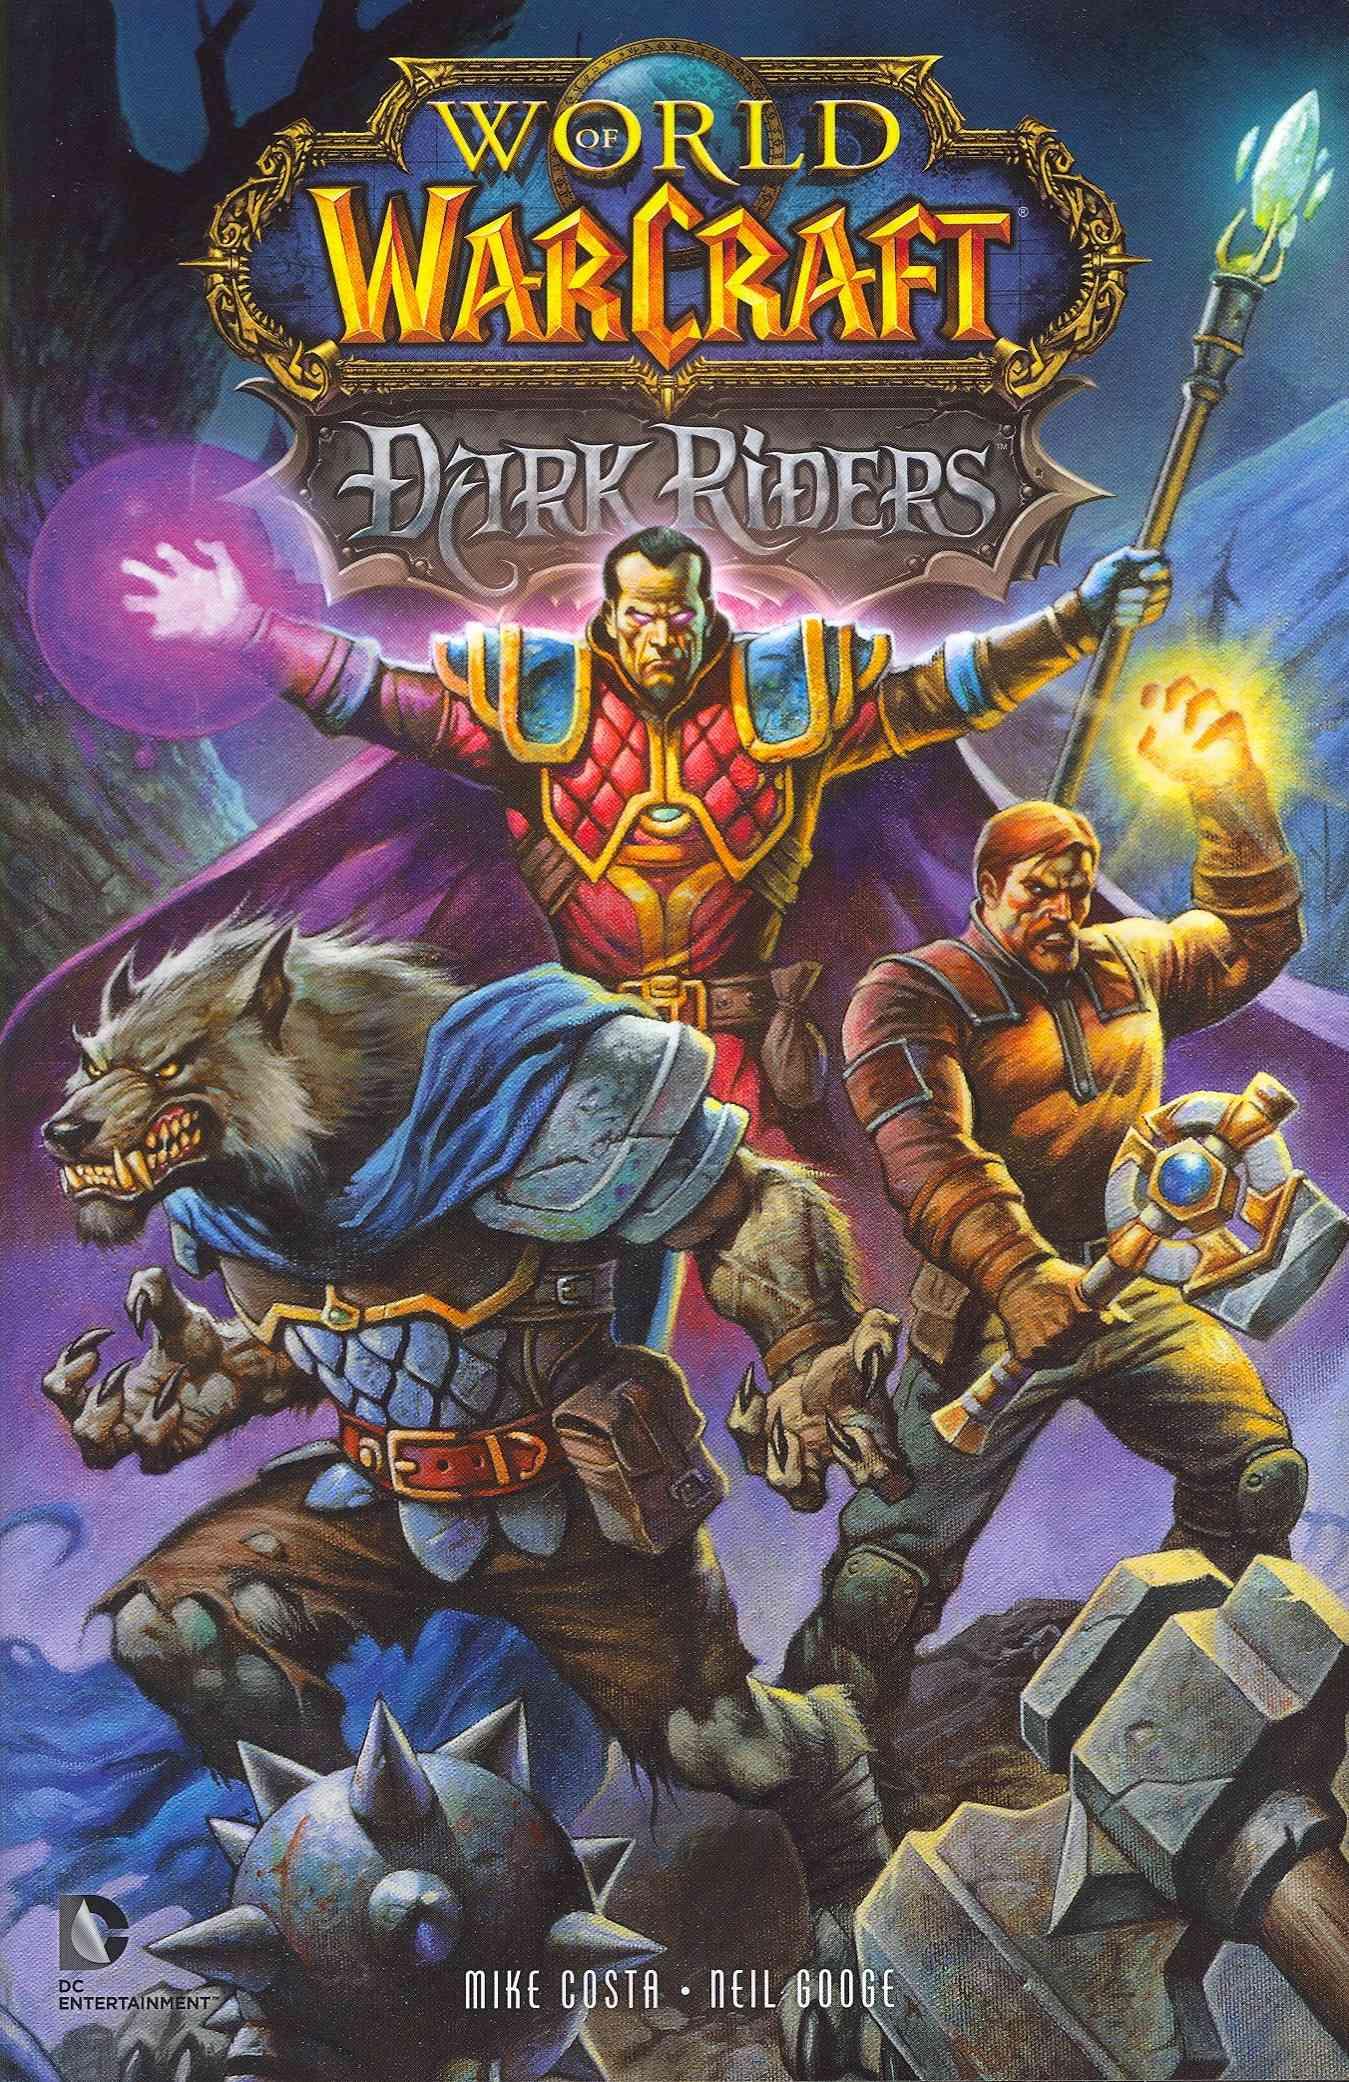 World of Warcraft: Dark Riders (Hardcover)